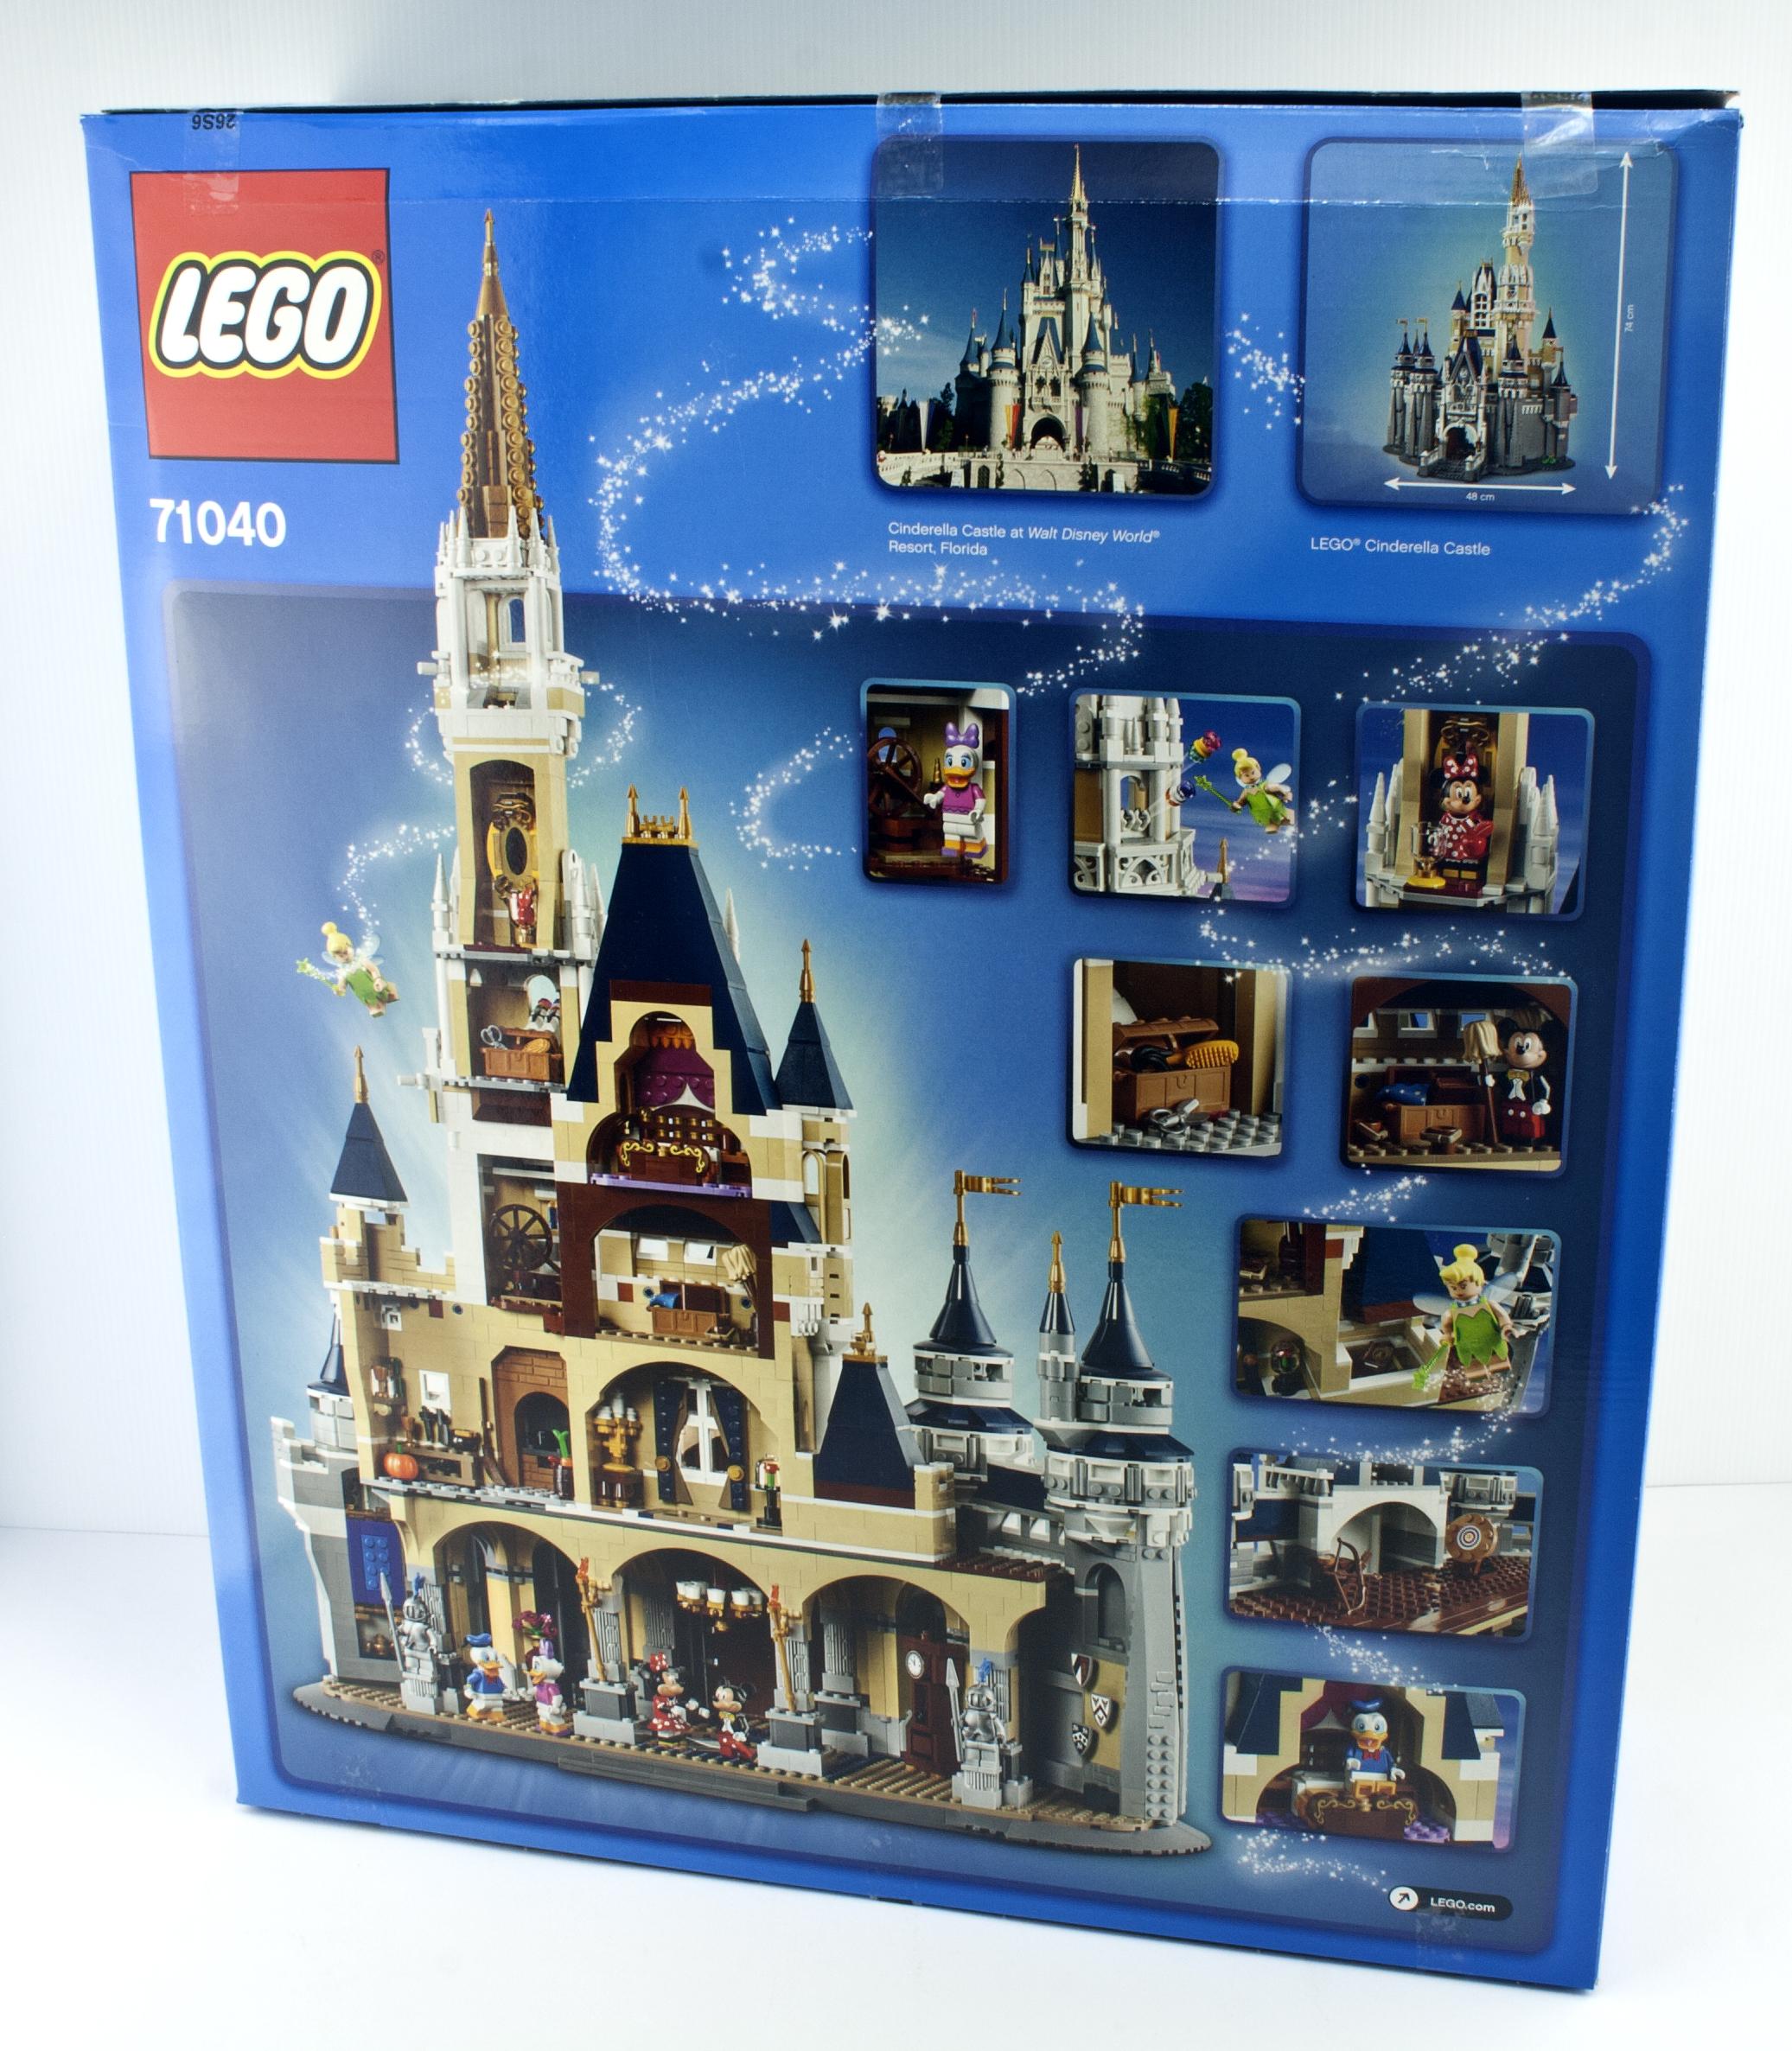 Review - LEGO 71040 The Disney Castle | Rebrickable - Build with LEGO